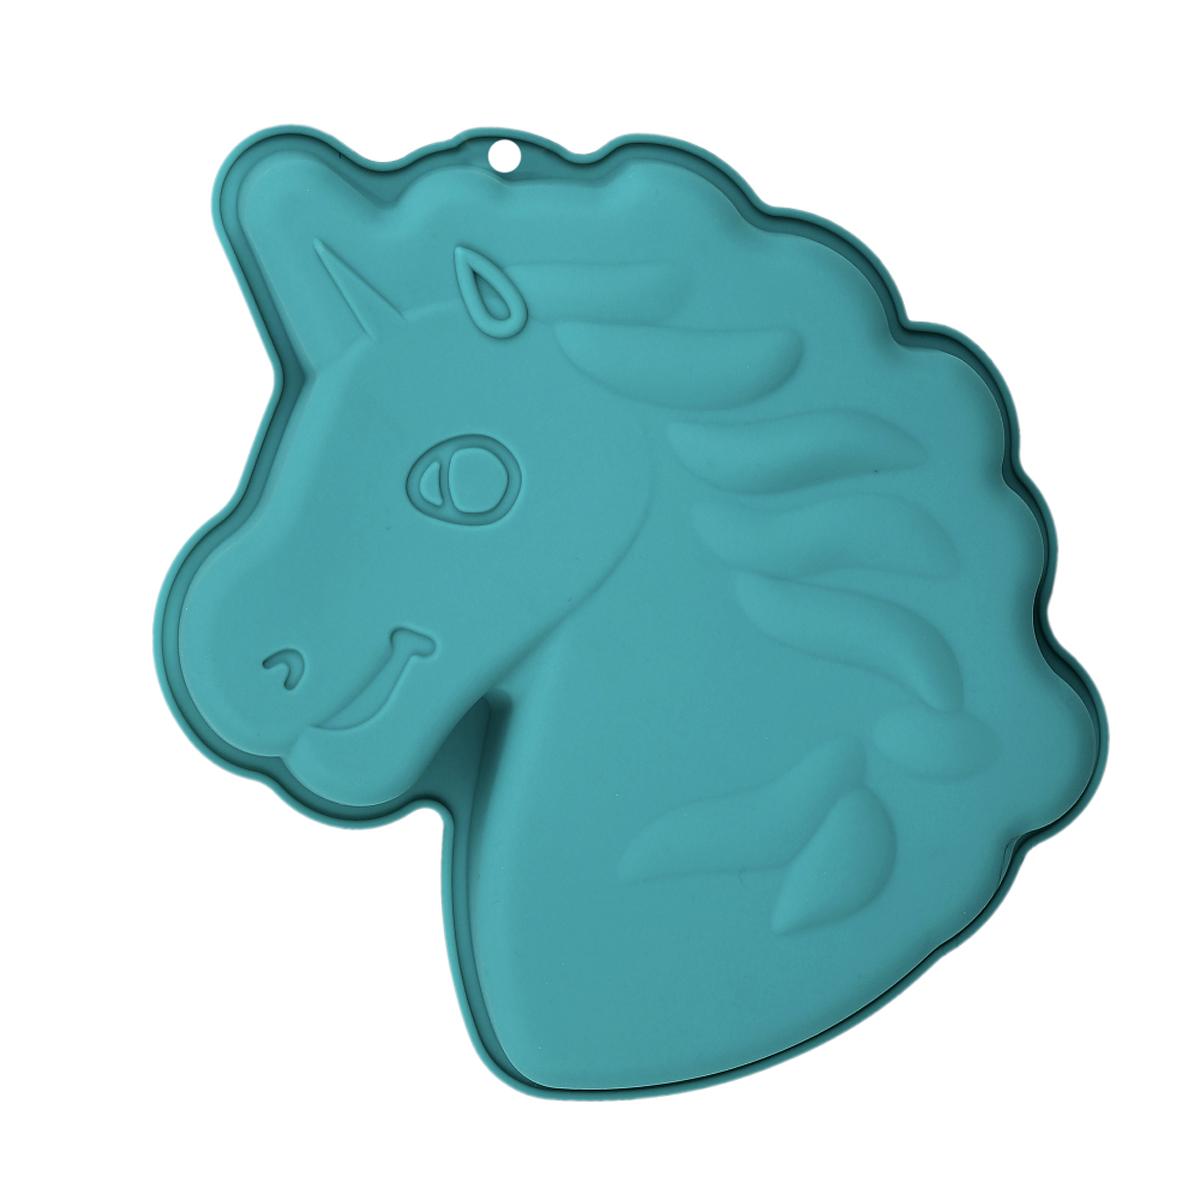 Moule silicone \'Licorne My Unicorn\' turquoise - 265x23 cm - [R0013]